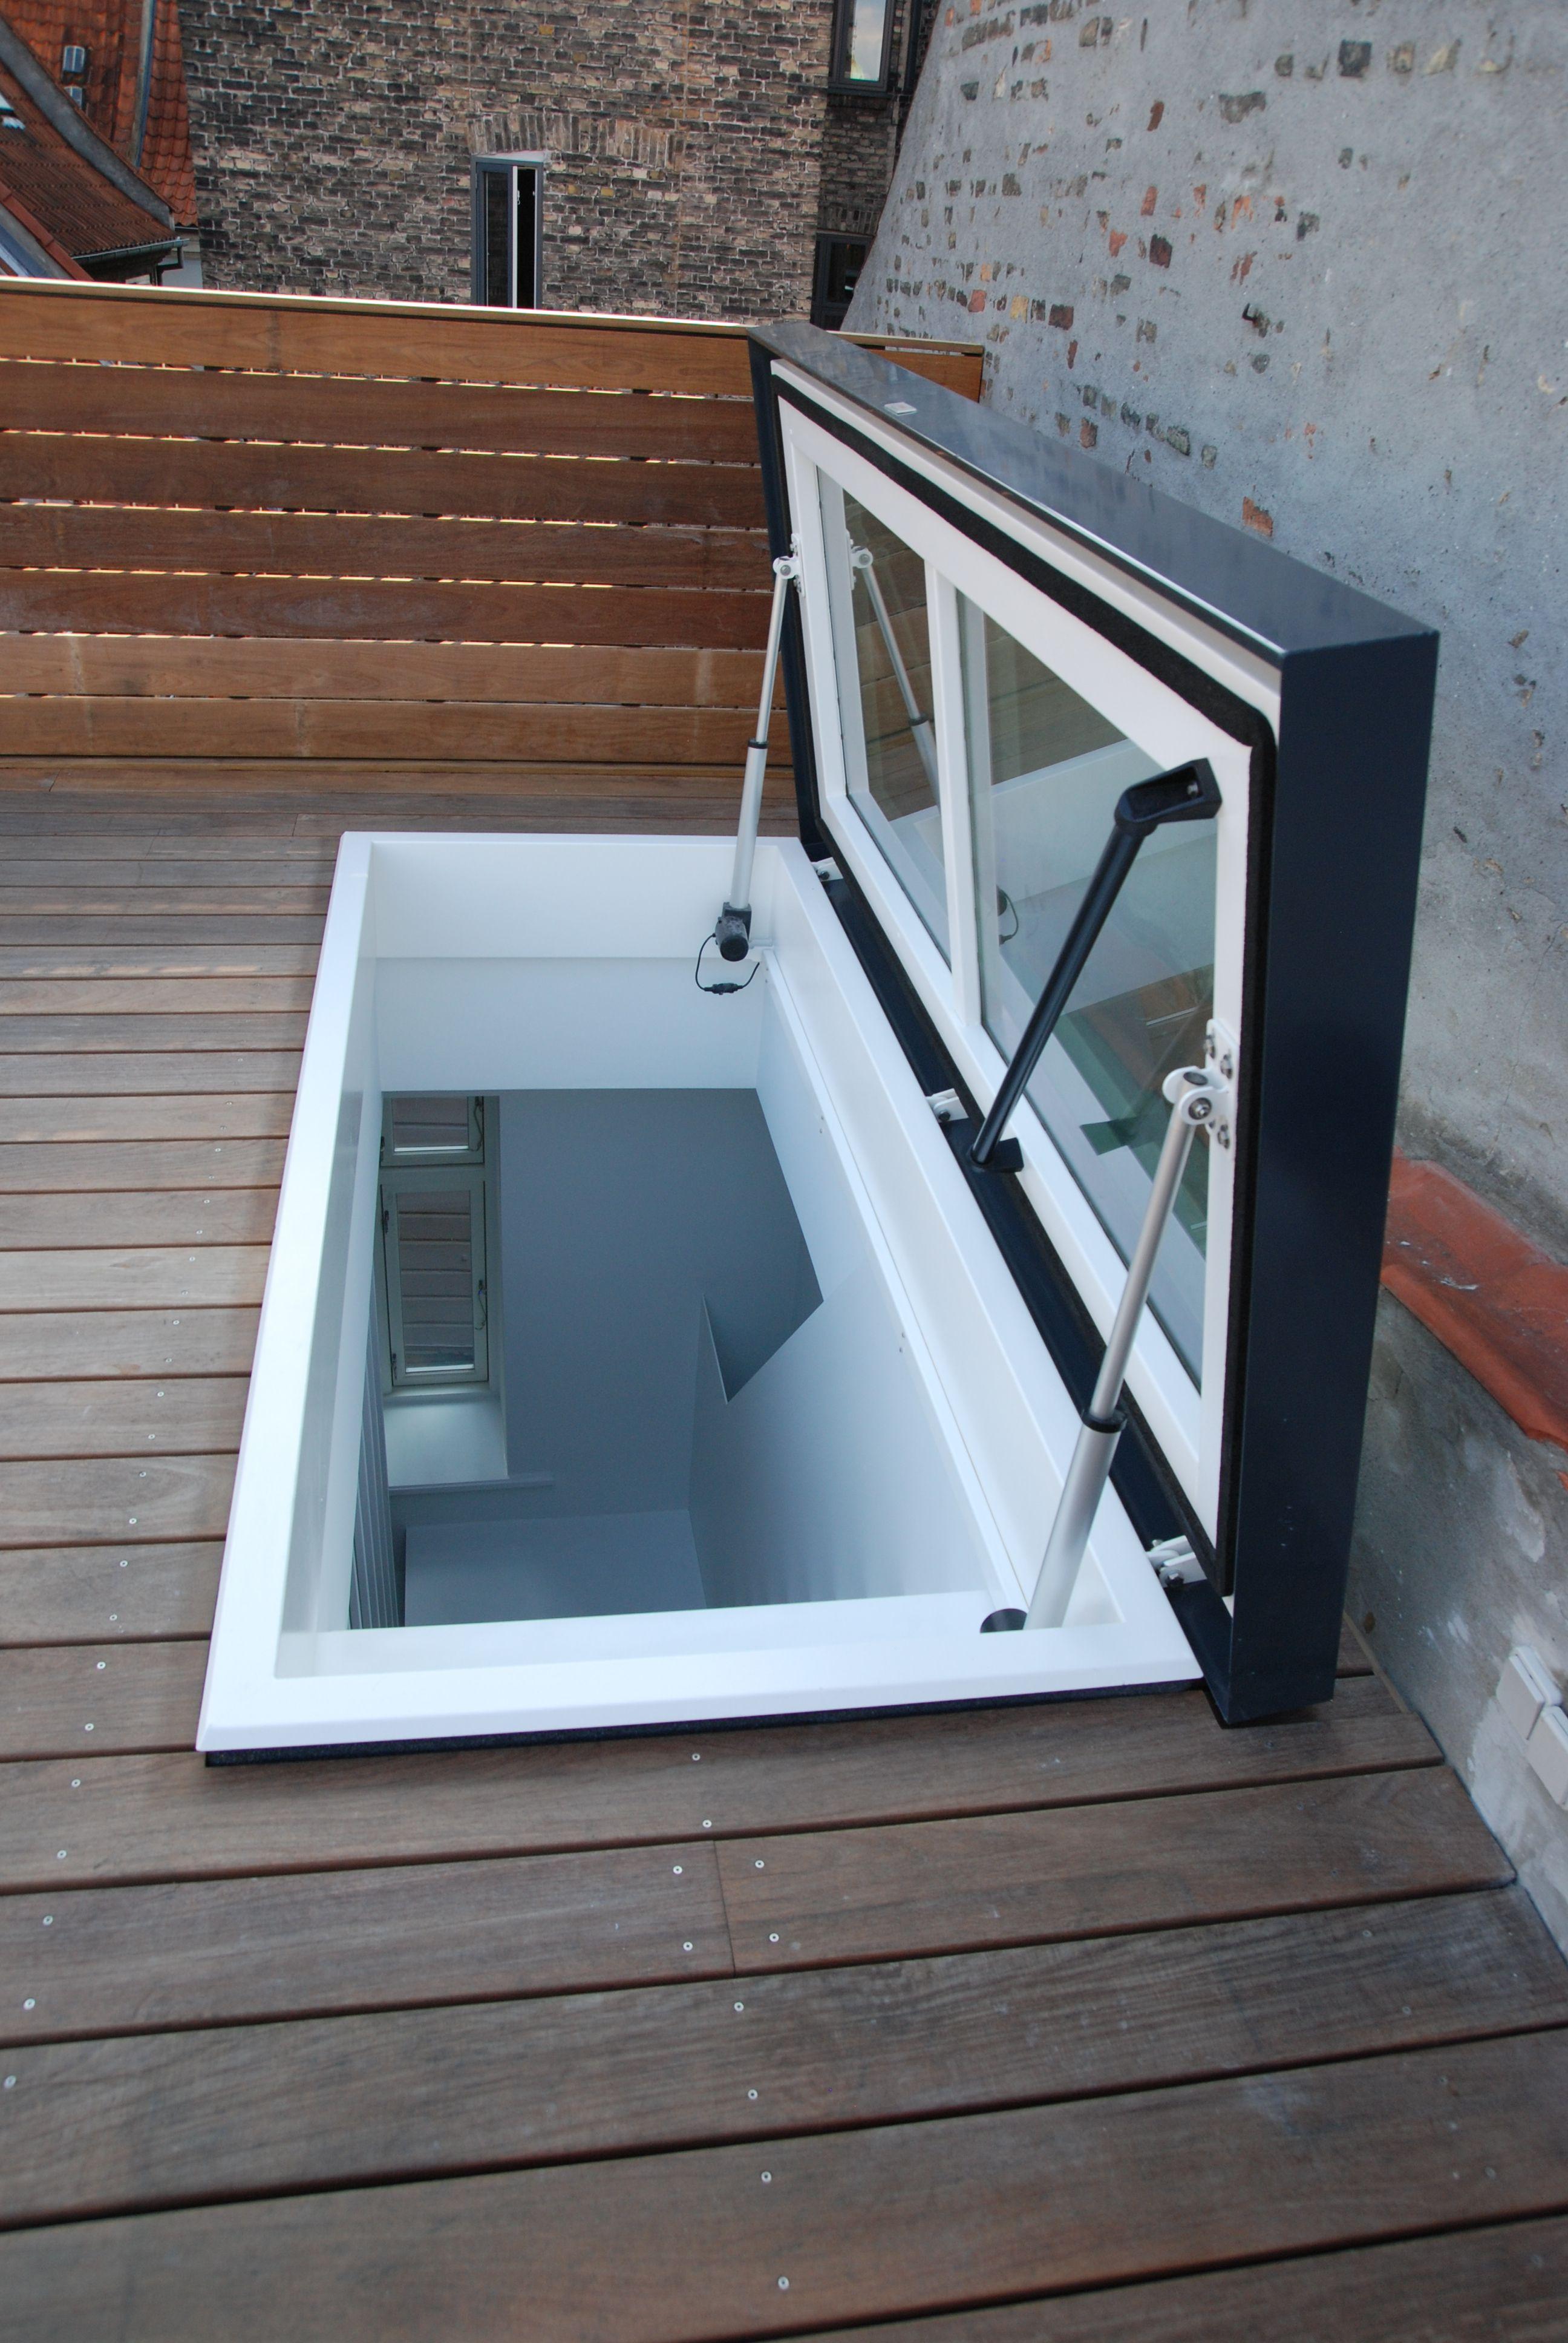 staka roof access hatch tagluge in k benhavn copenhagen. Black Bedroom Furniture Sets. Home Design Ideas